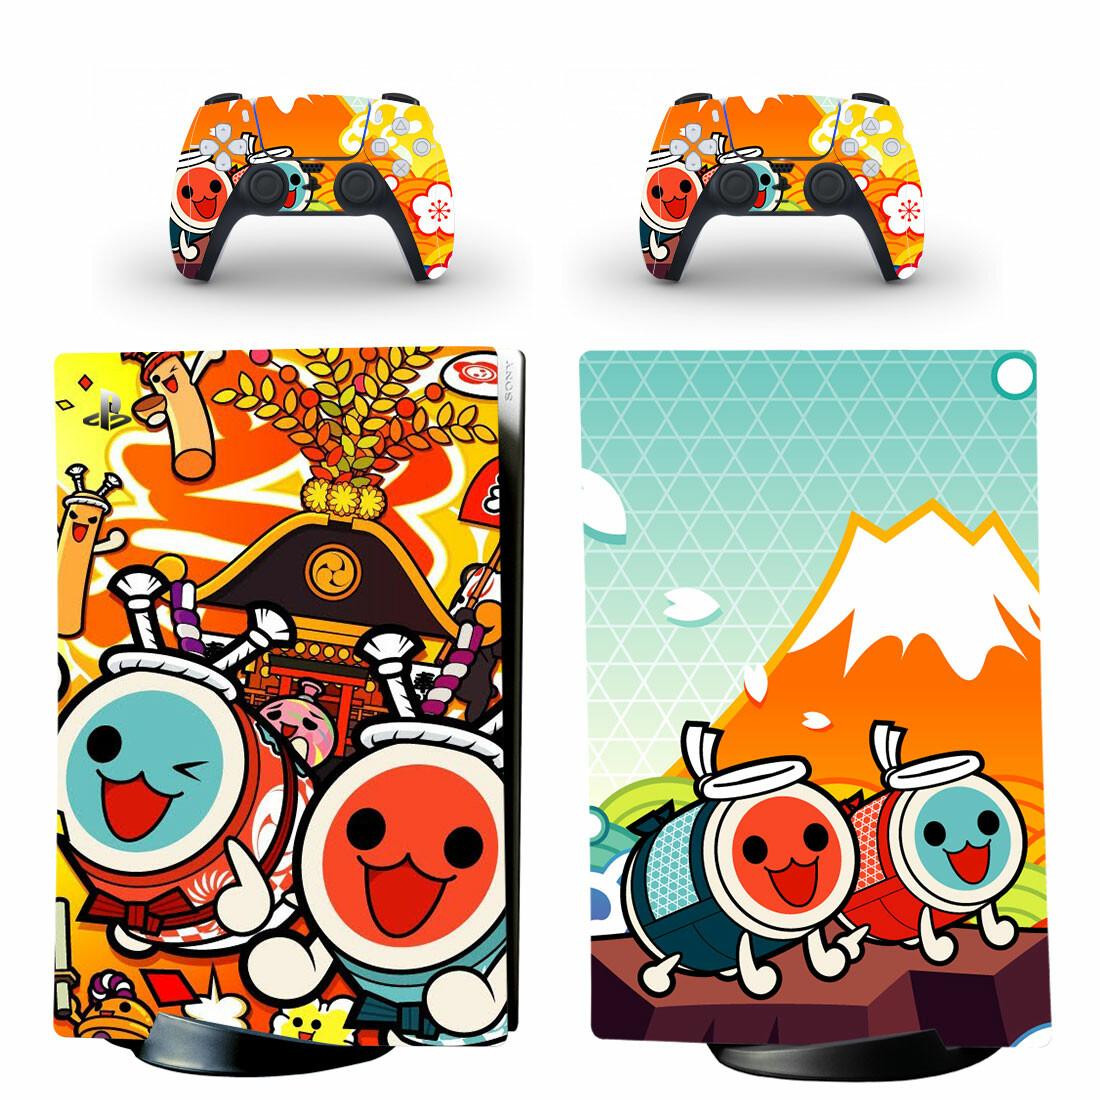 Taiko No Tatsujin Skin Sticker Decal For PS5 Digital Edition